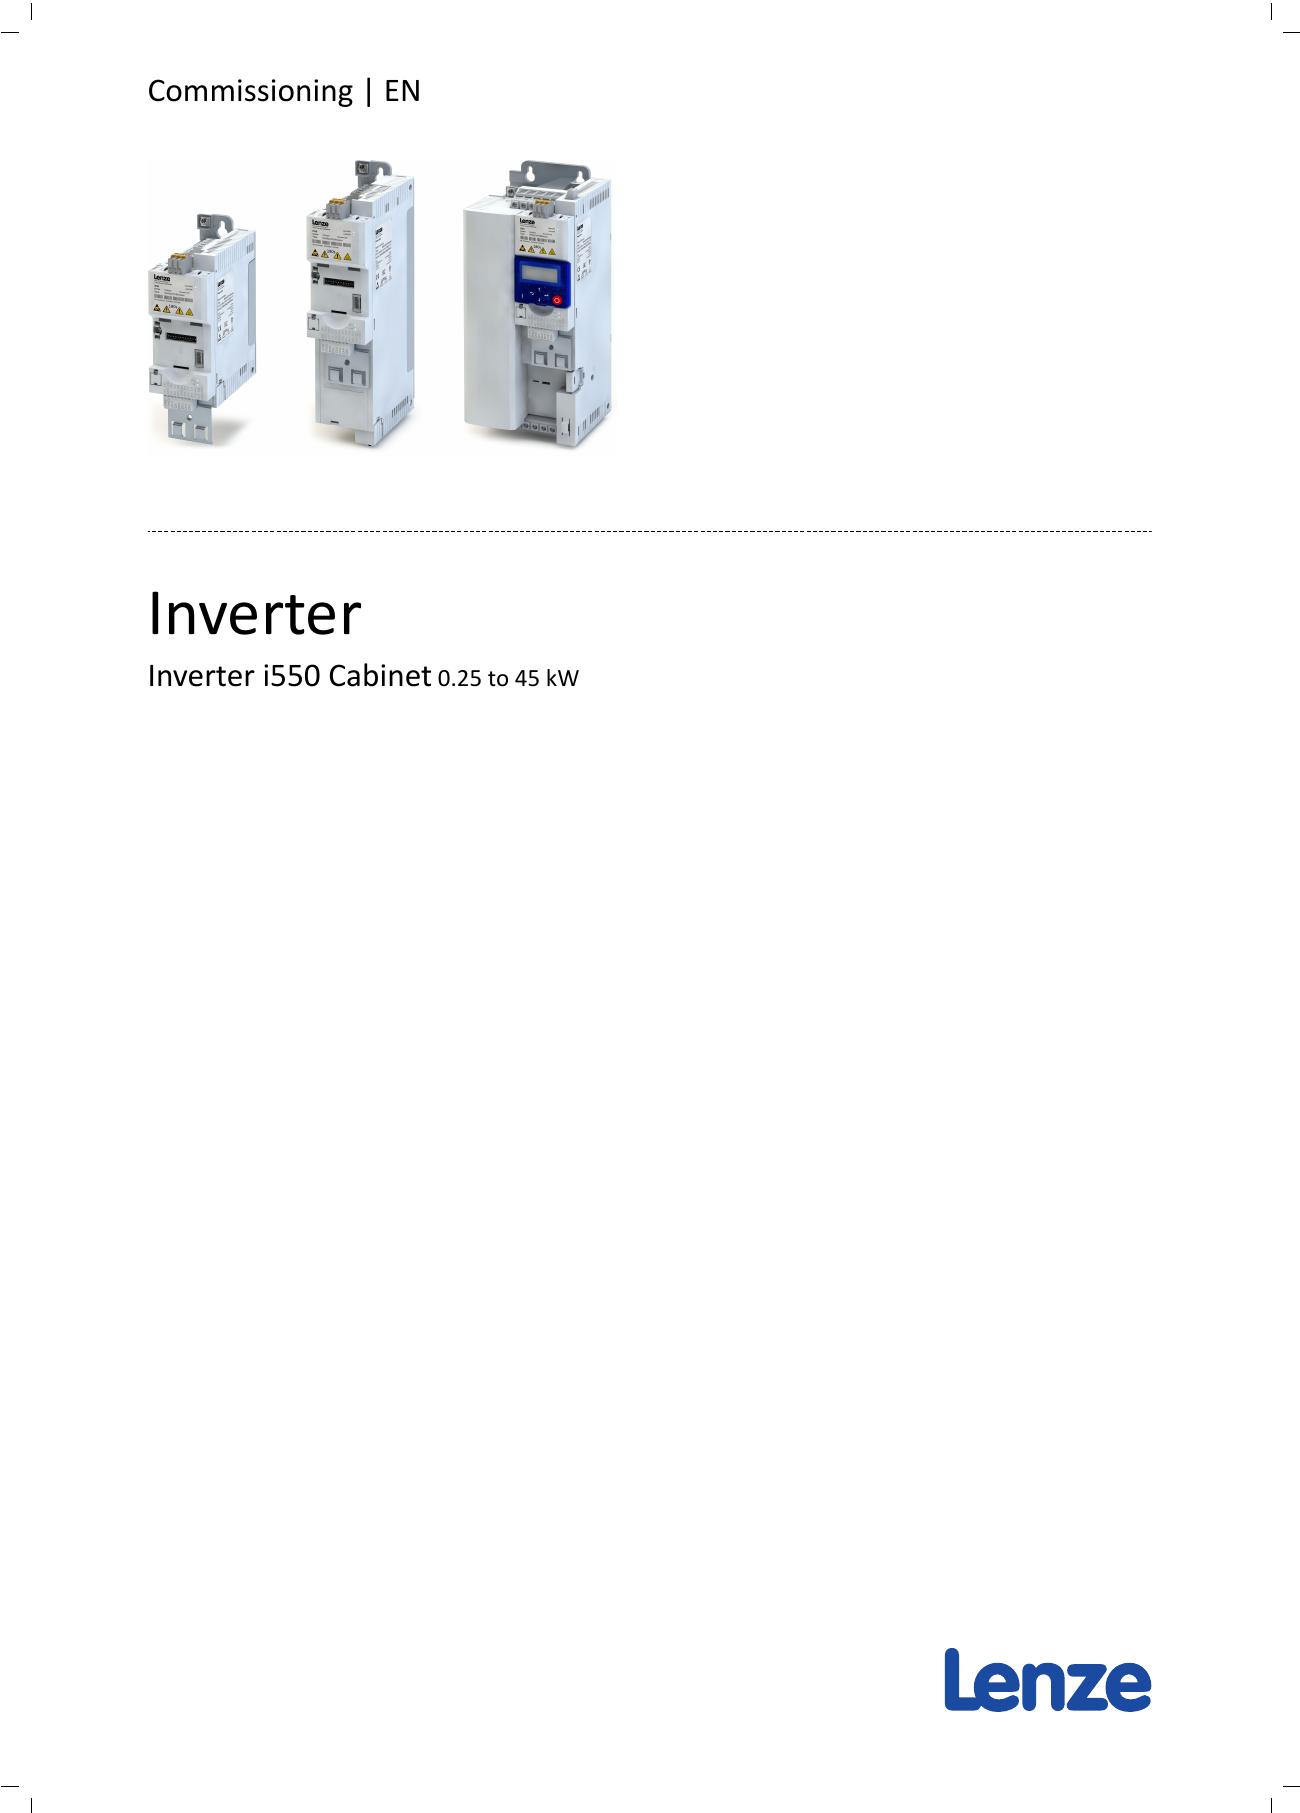 Lenze i550 Manual - Inverter Drive Supermarket | manualzz com